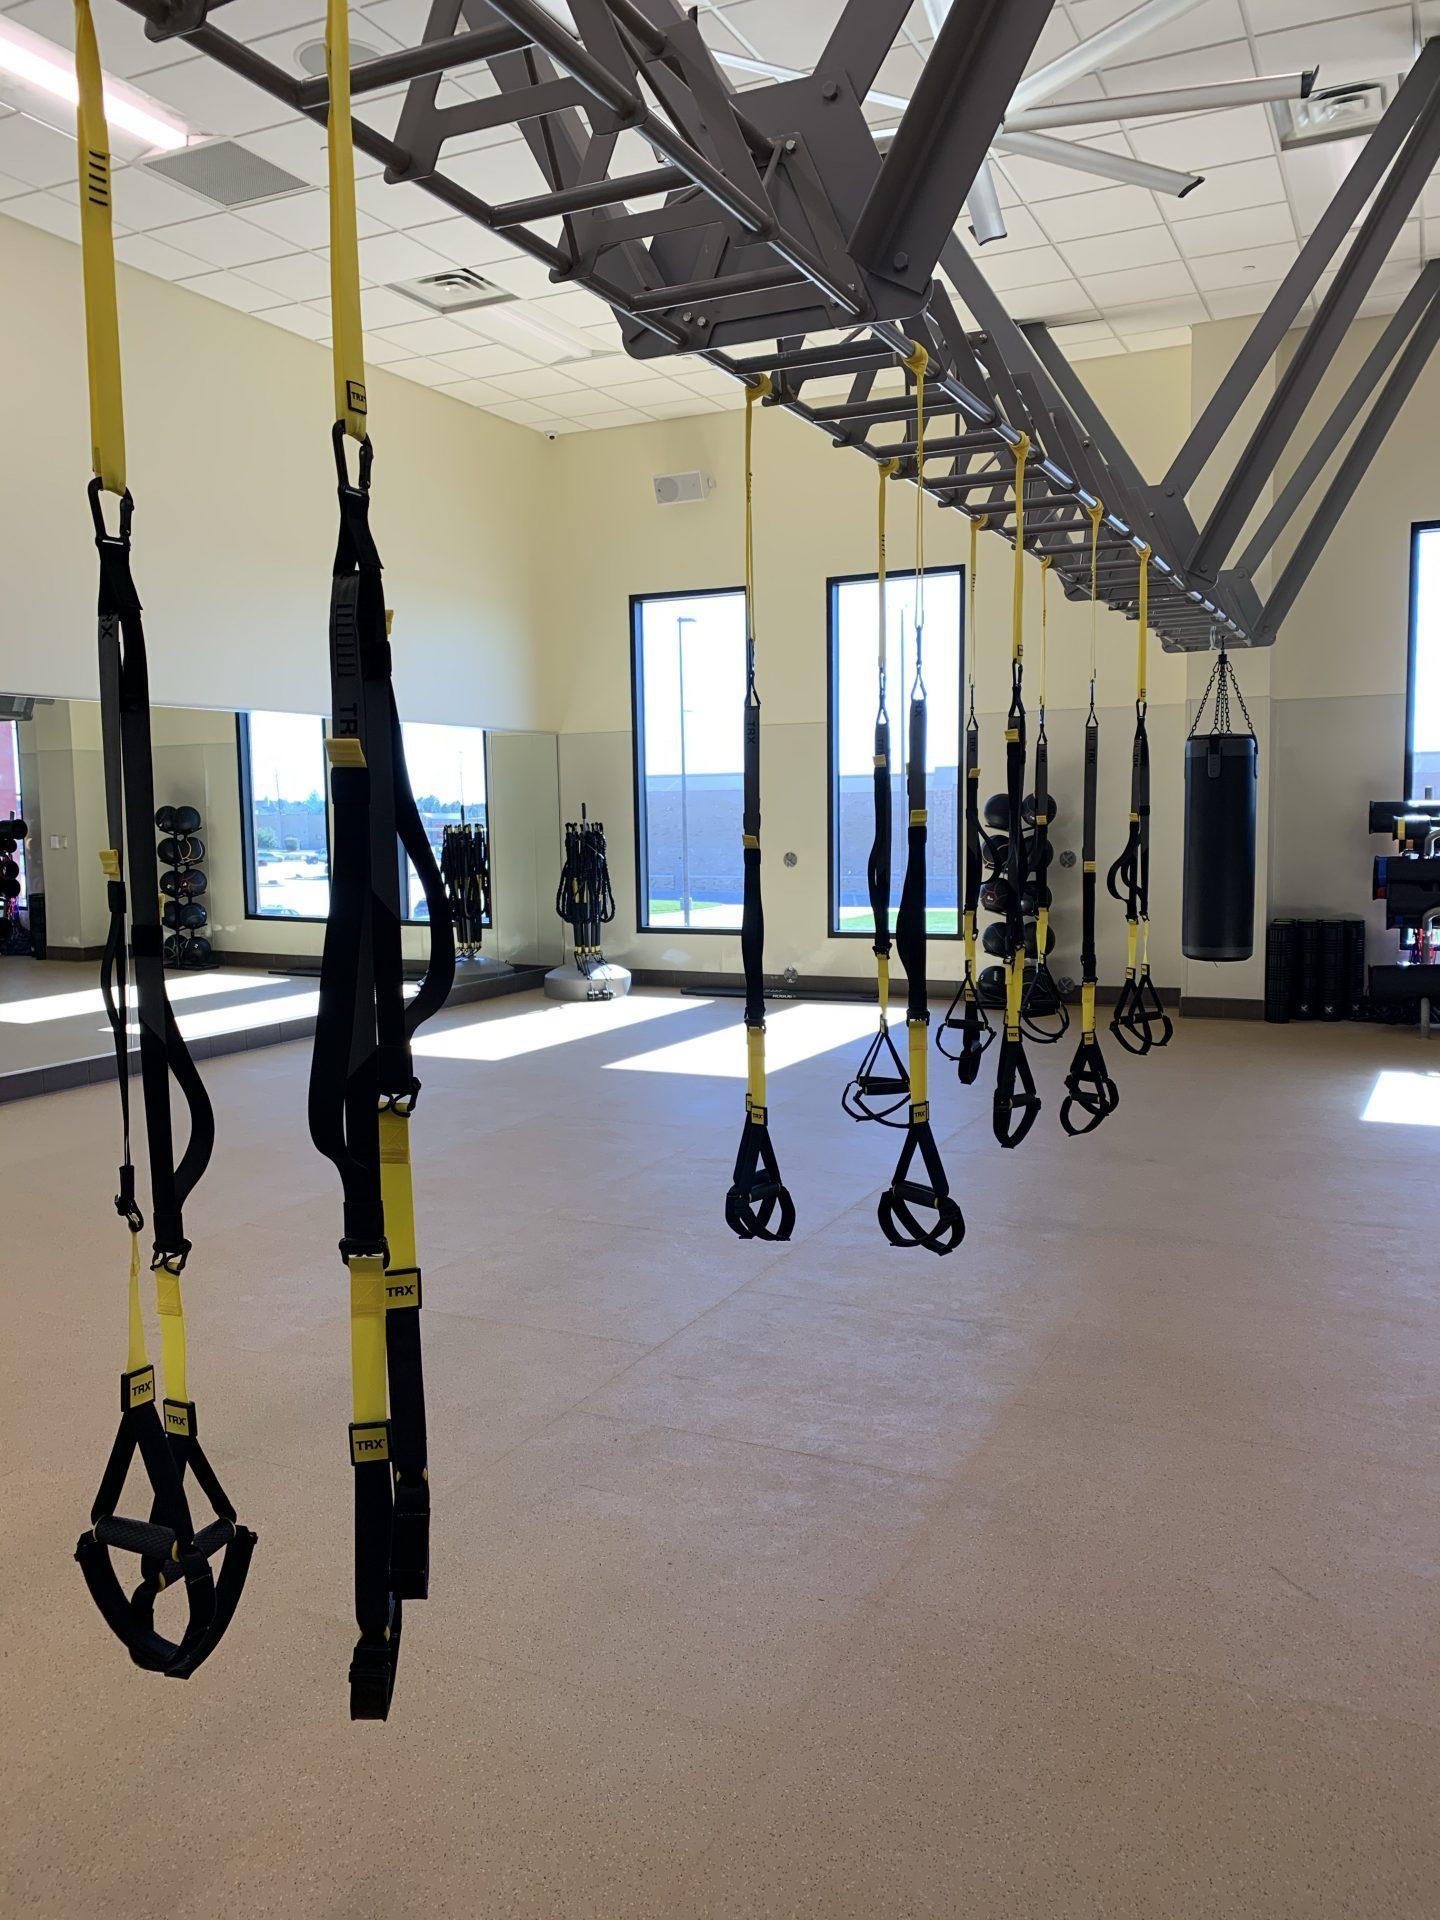 TRX Suspension Training room - gyms in katy tx - villasport cinco ranch